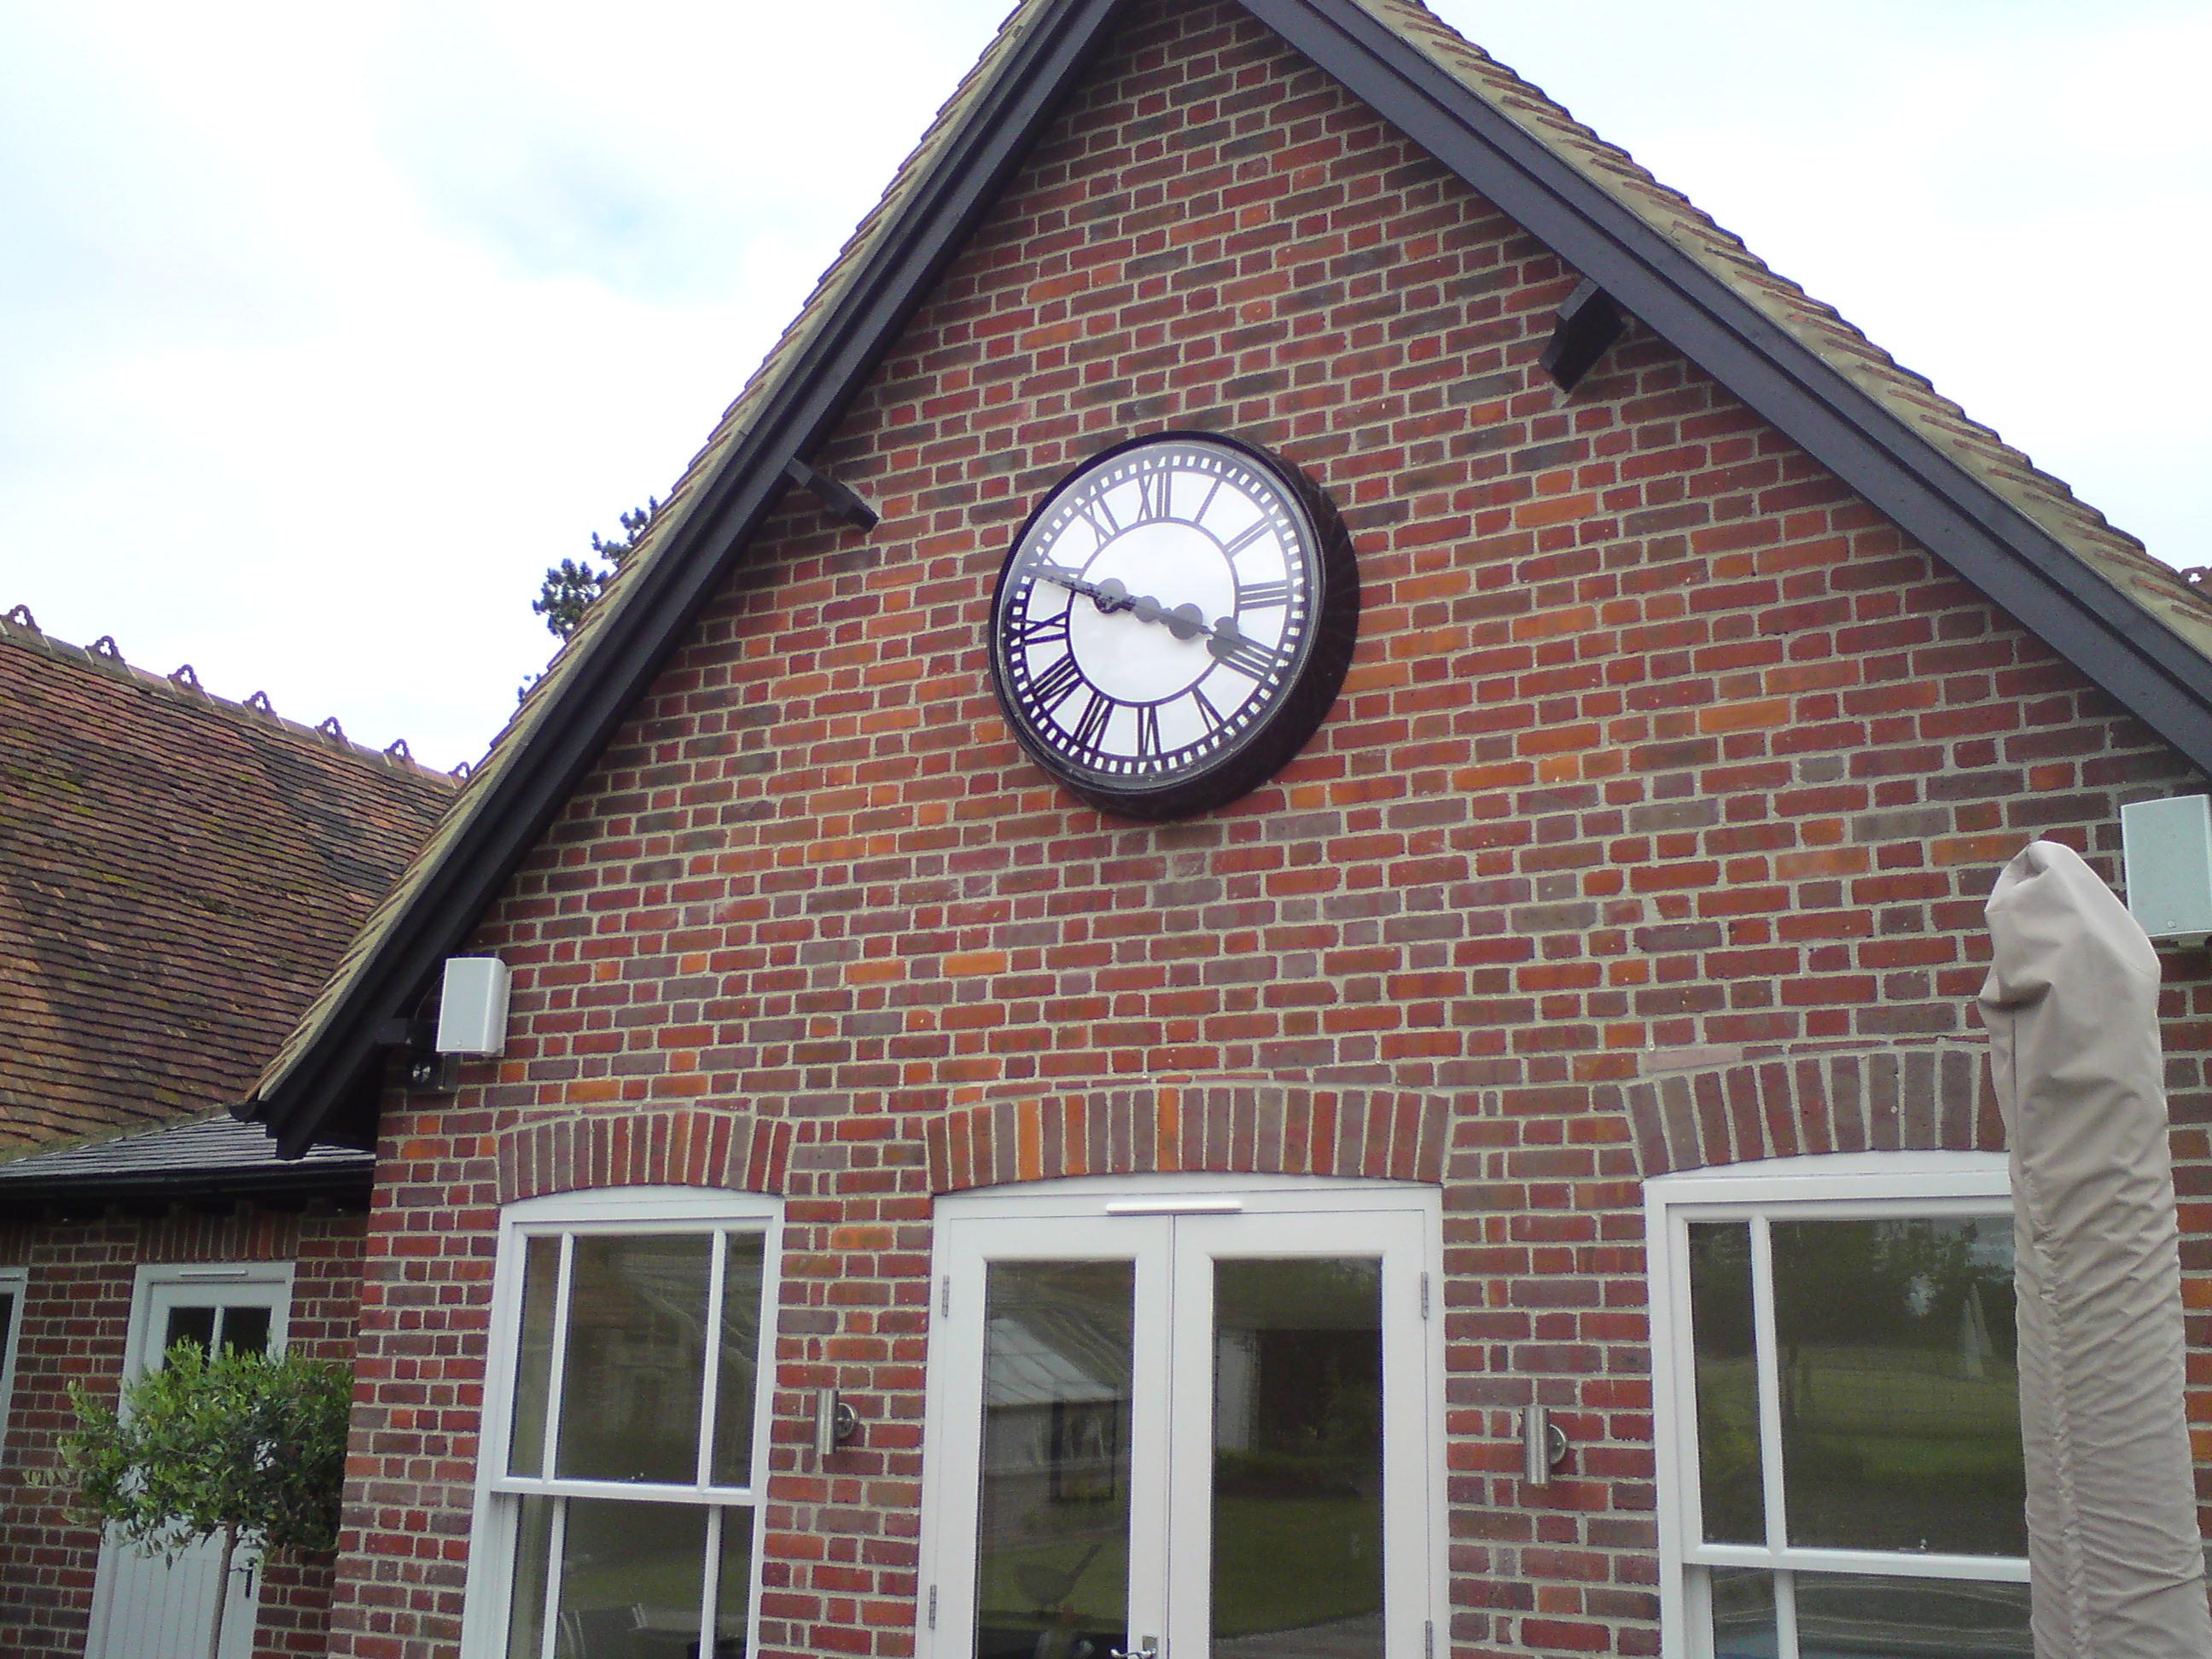 Large garden exterior clock